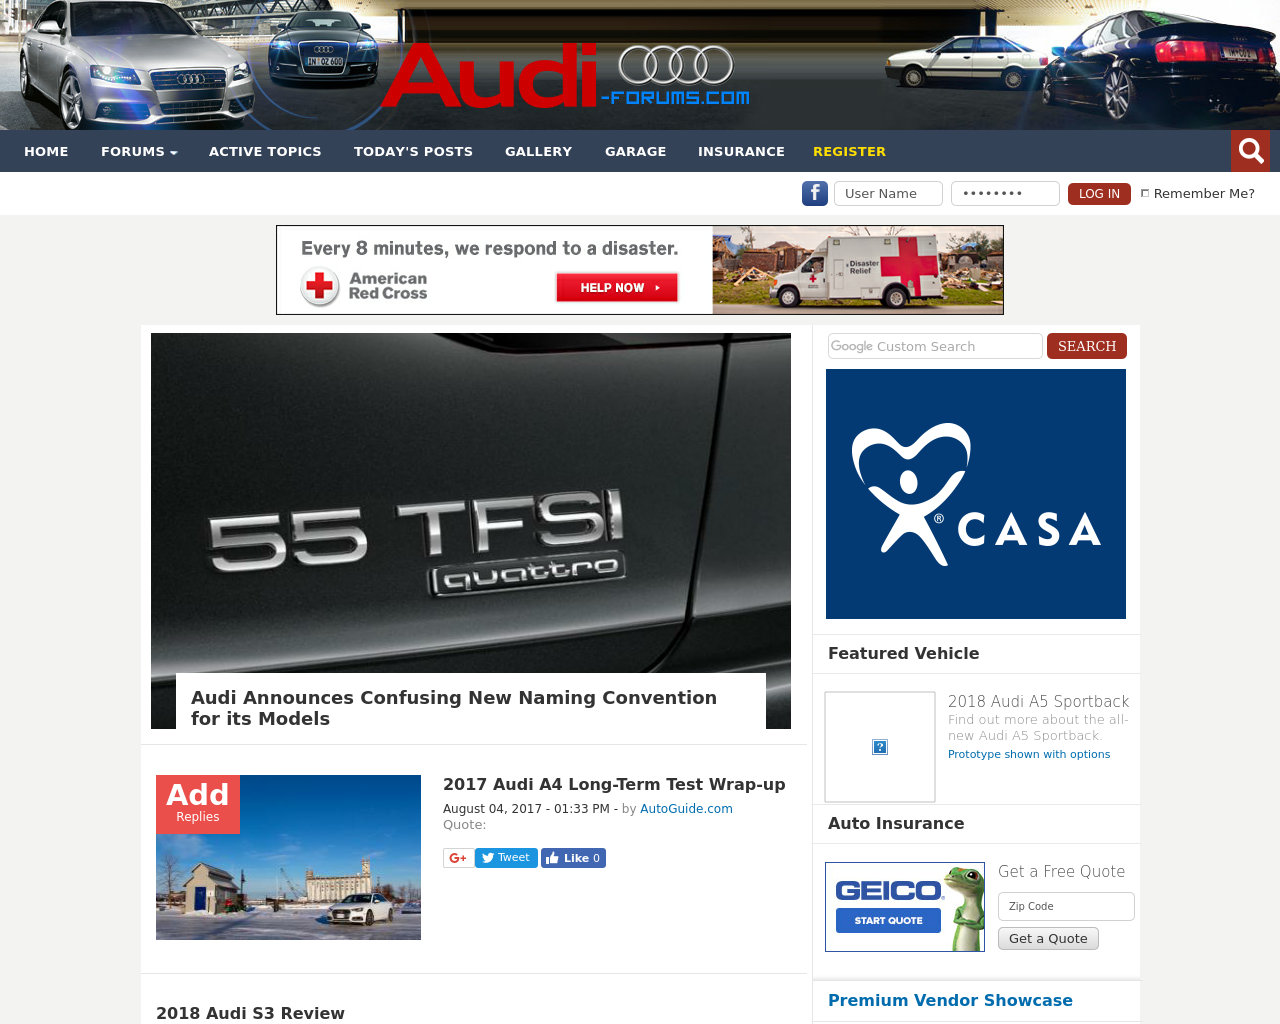 Audi-forums.com-Advertising-Reviews-Pricing